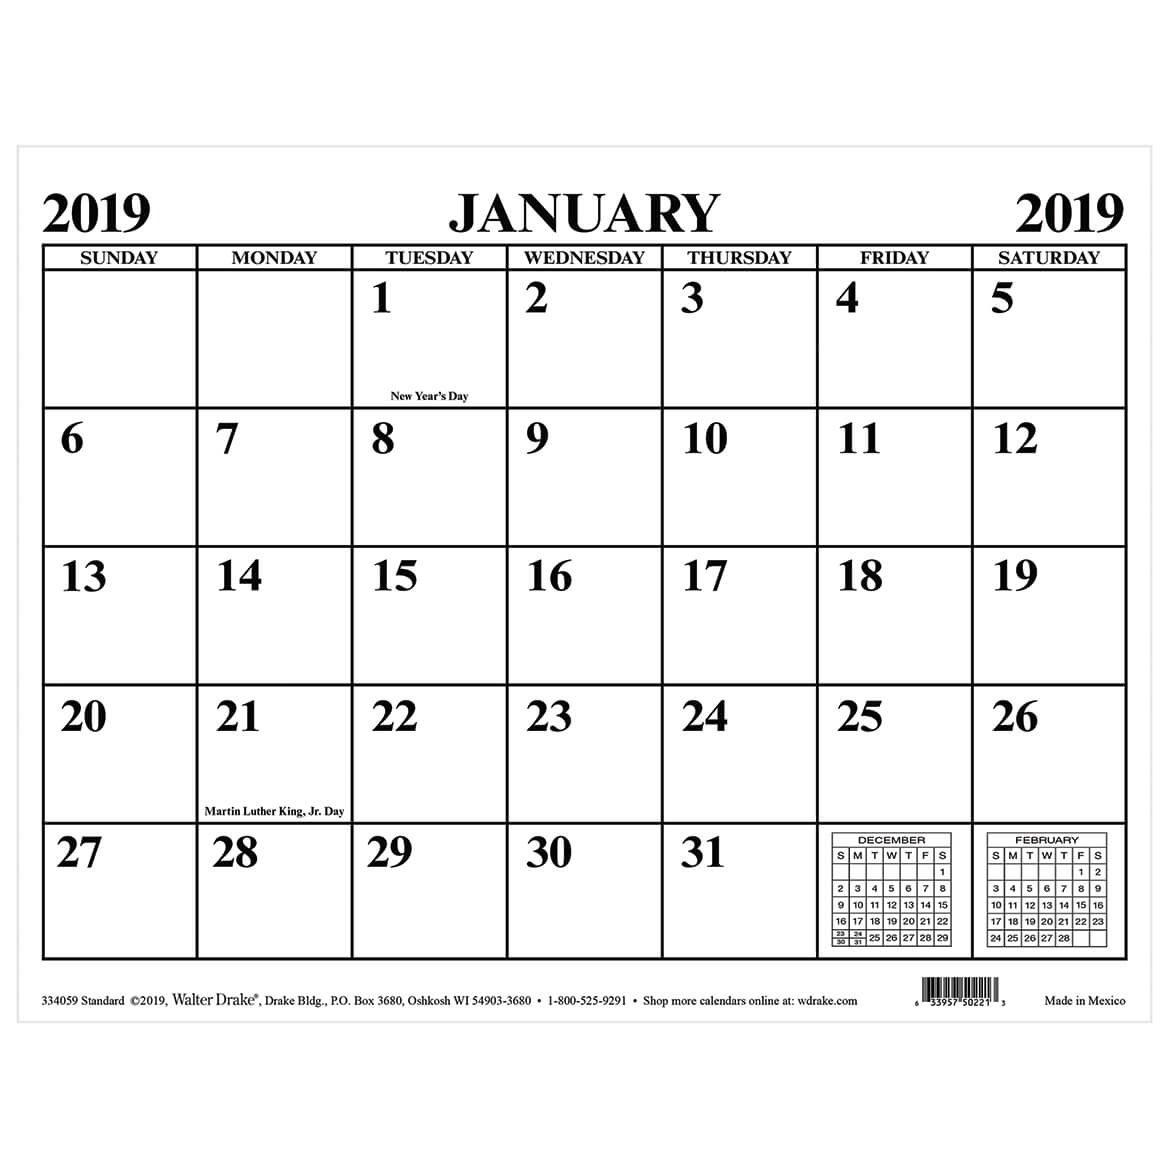 Magnetic Calendar – Monthly Magnetic Calendar – Walter Drake Calendar 2019 Magnet